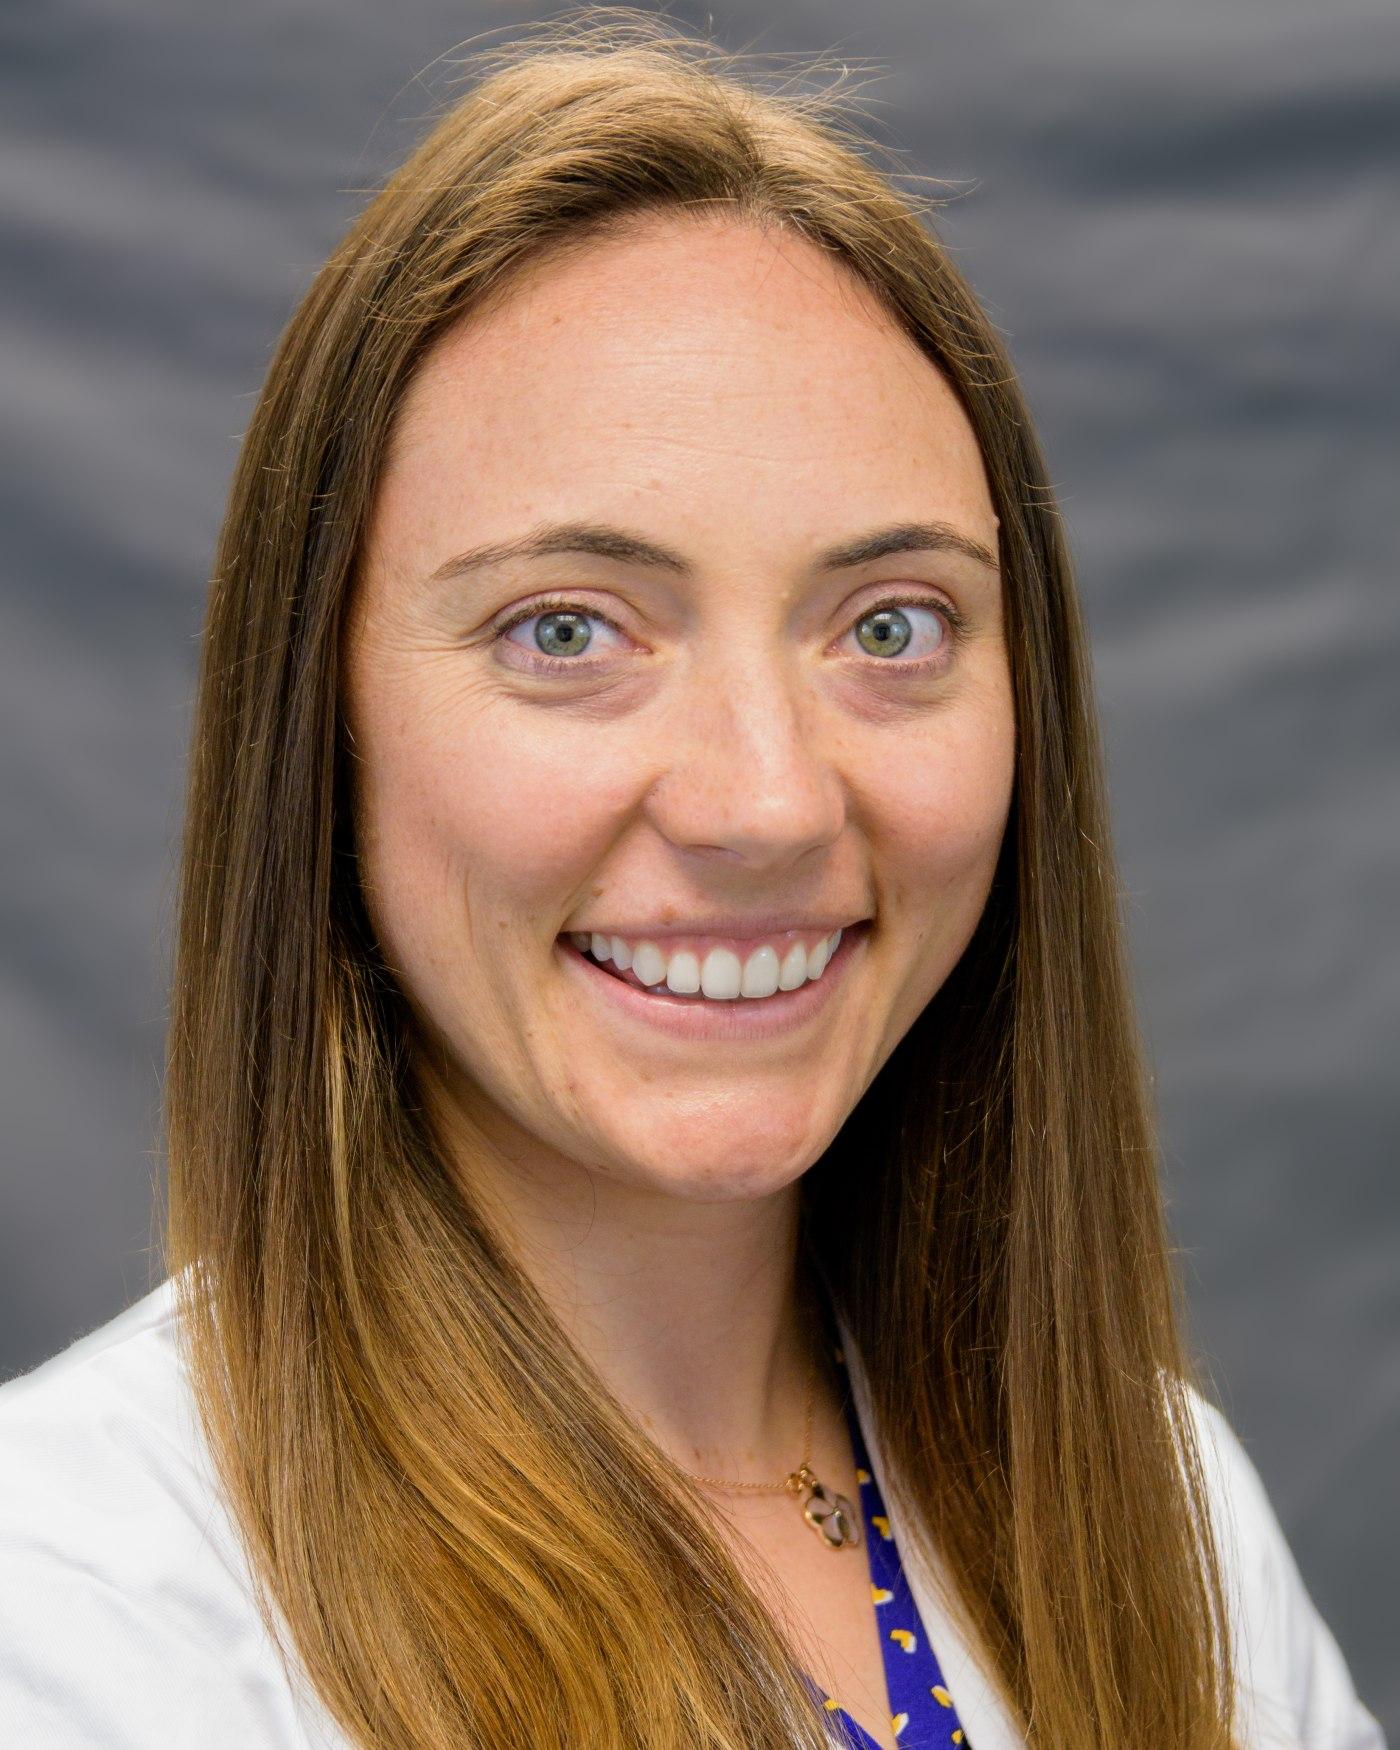 Dr. Alana Munger